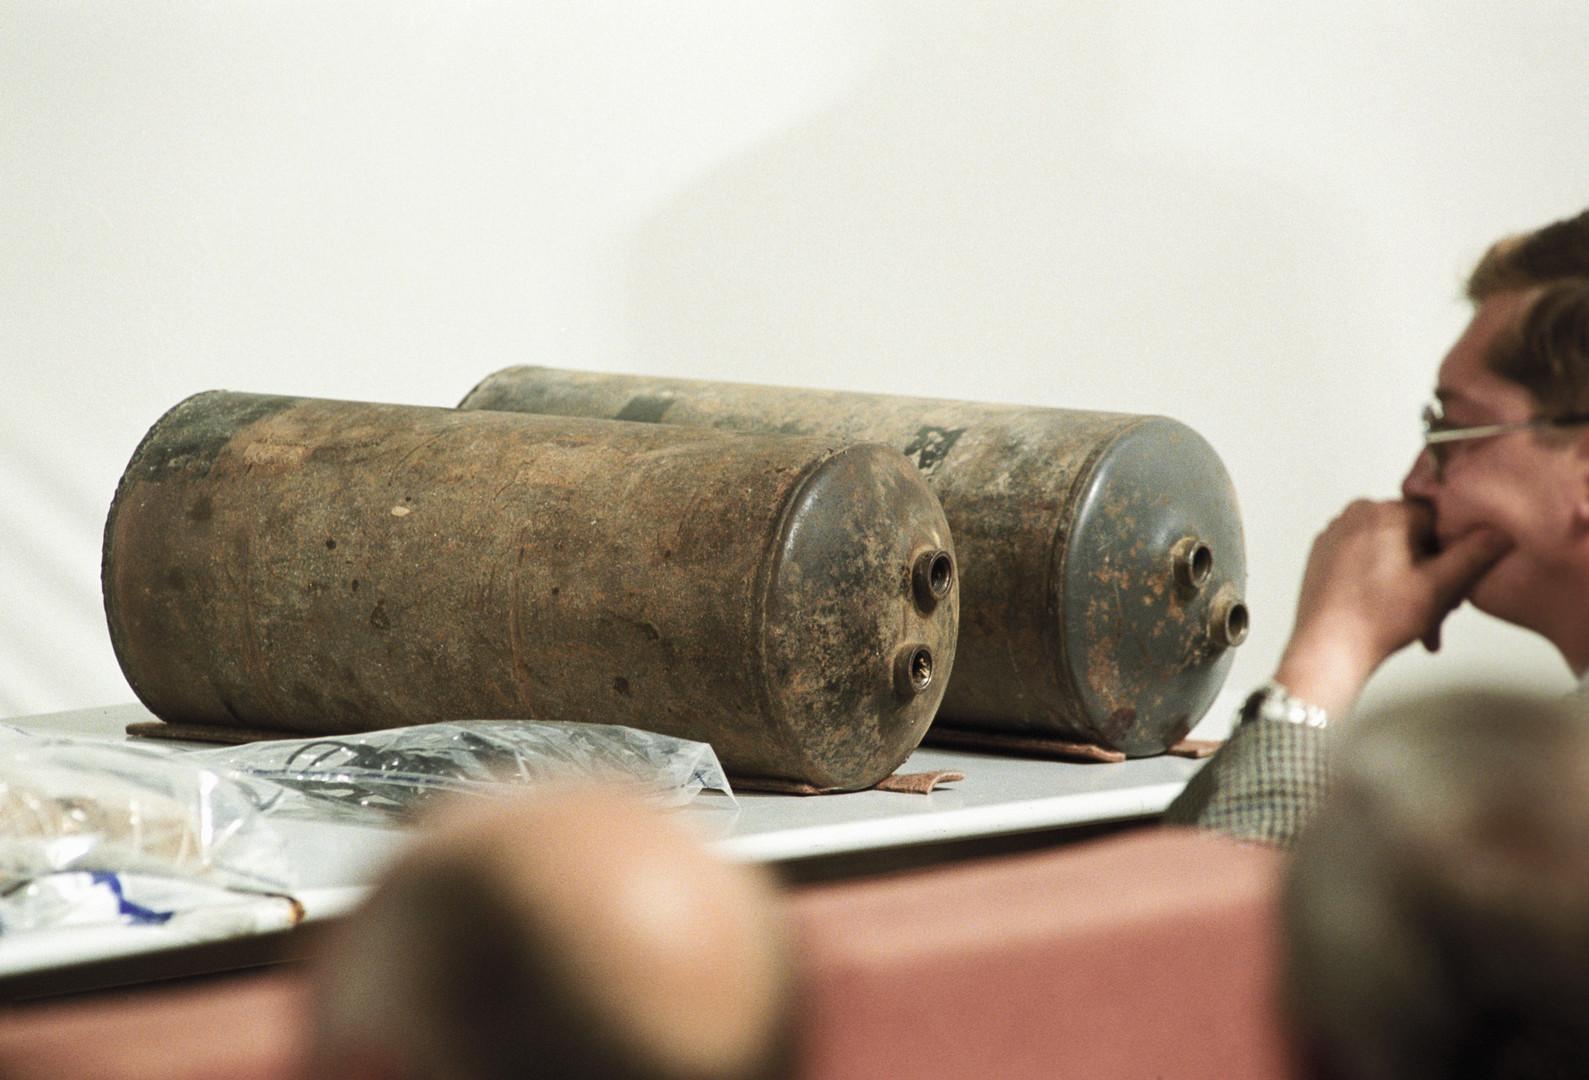 Des explosifs de fabrication artisanale